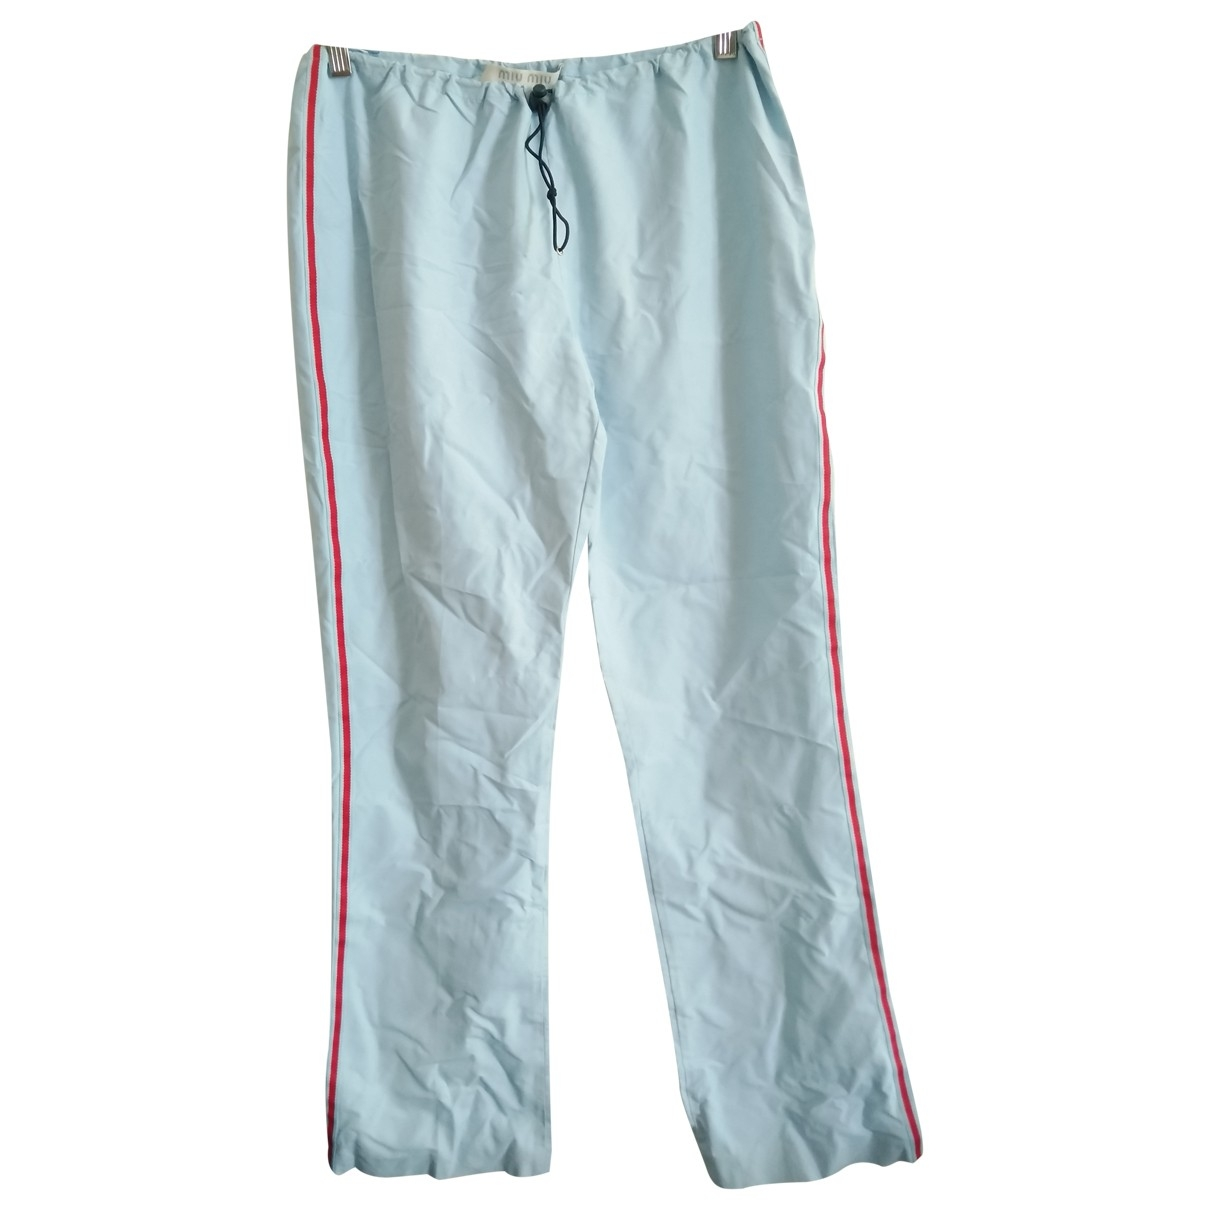 Miu Miu \N Blue Trousers for Women 44 IT